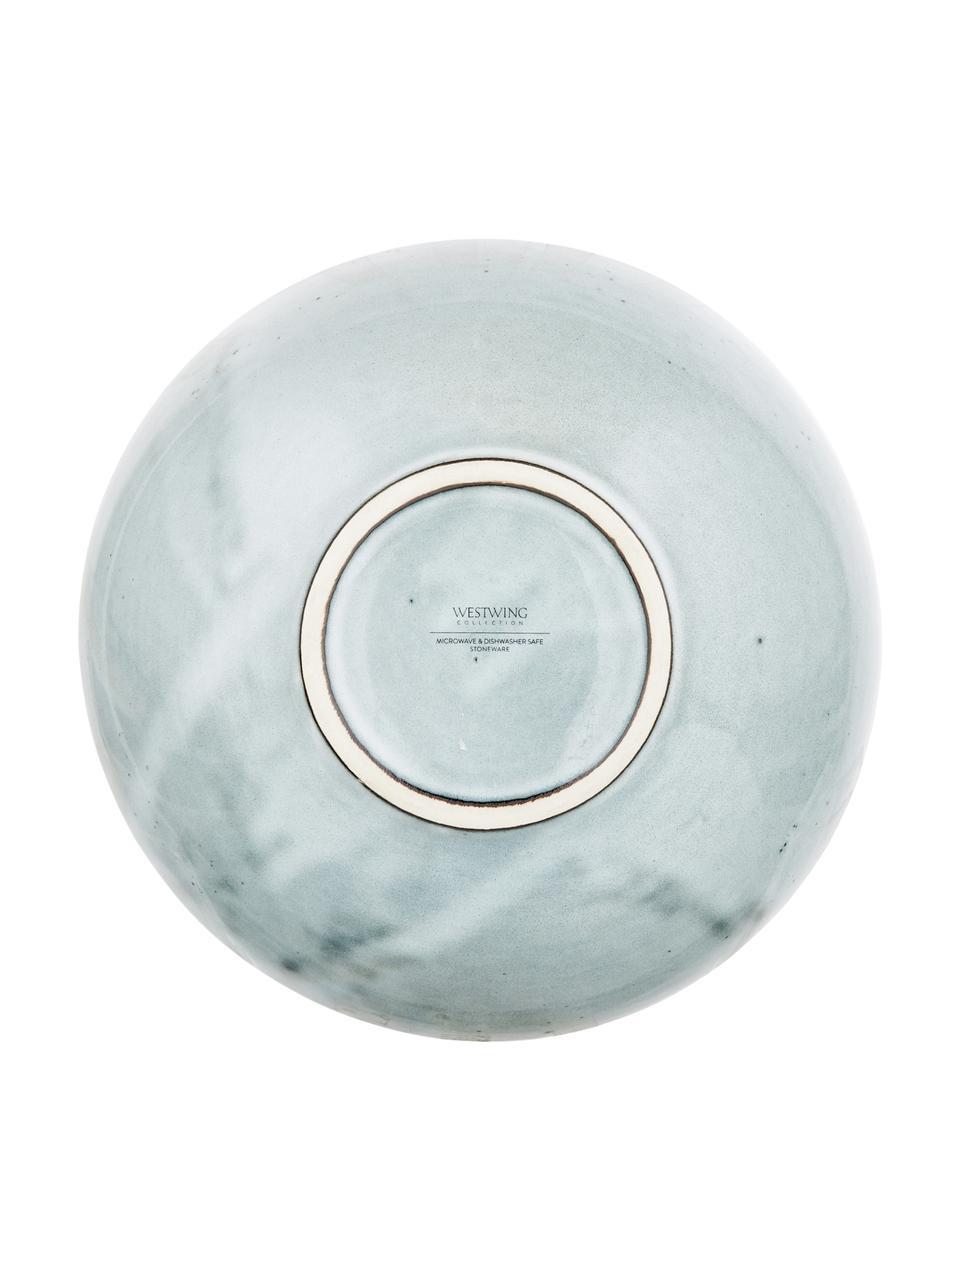 Ciotola in gres fatta a mano Thalia 2 pz, Gres, Blu grigio, Ø 18 x Alt. 6 cm